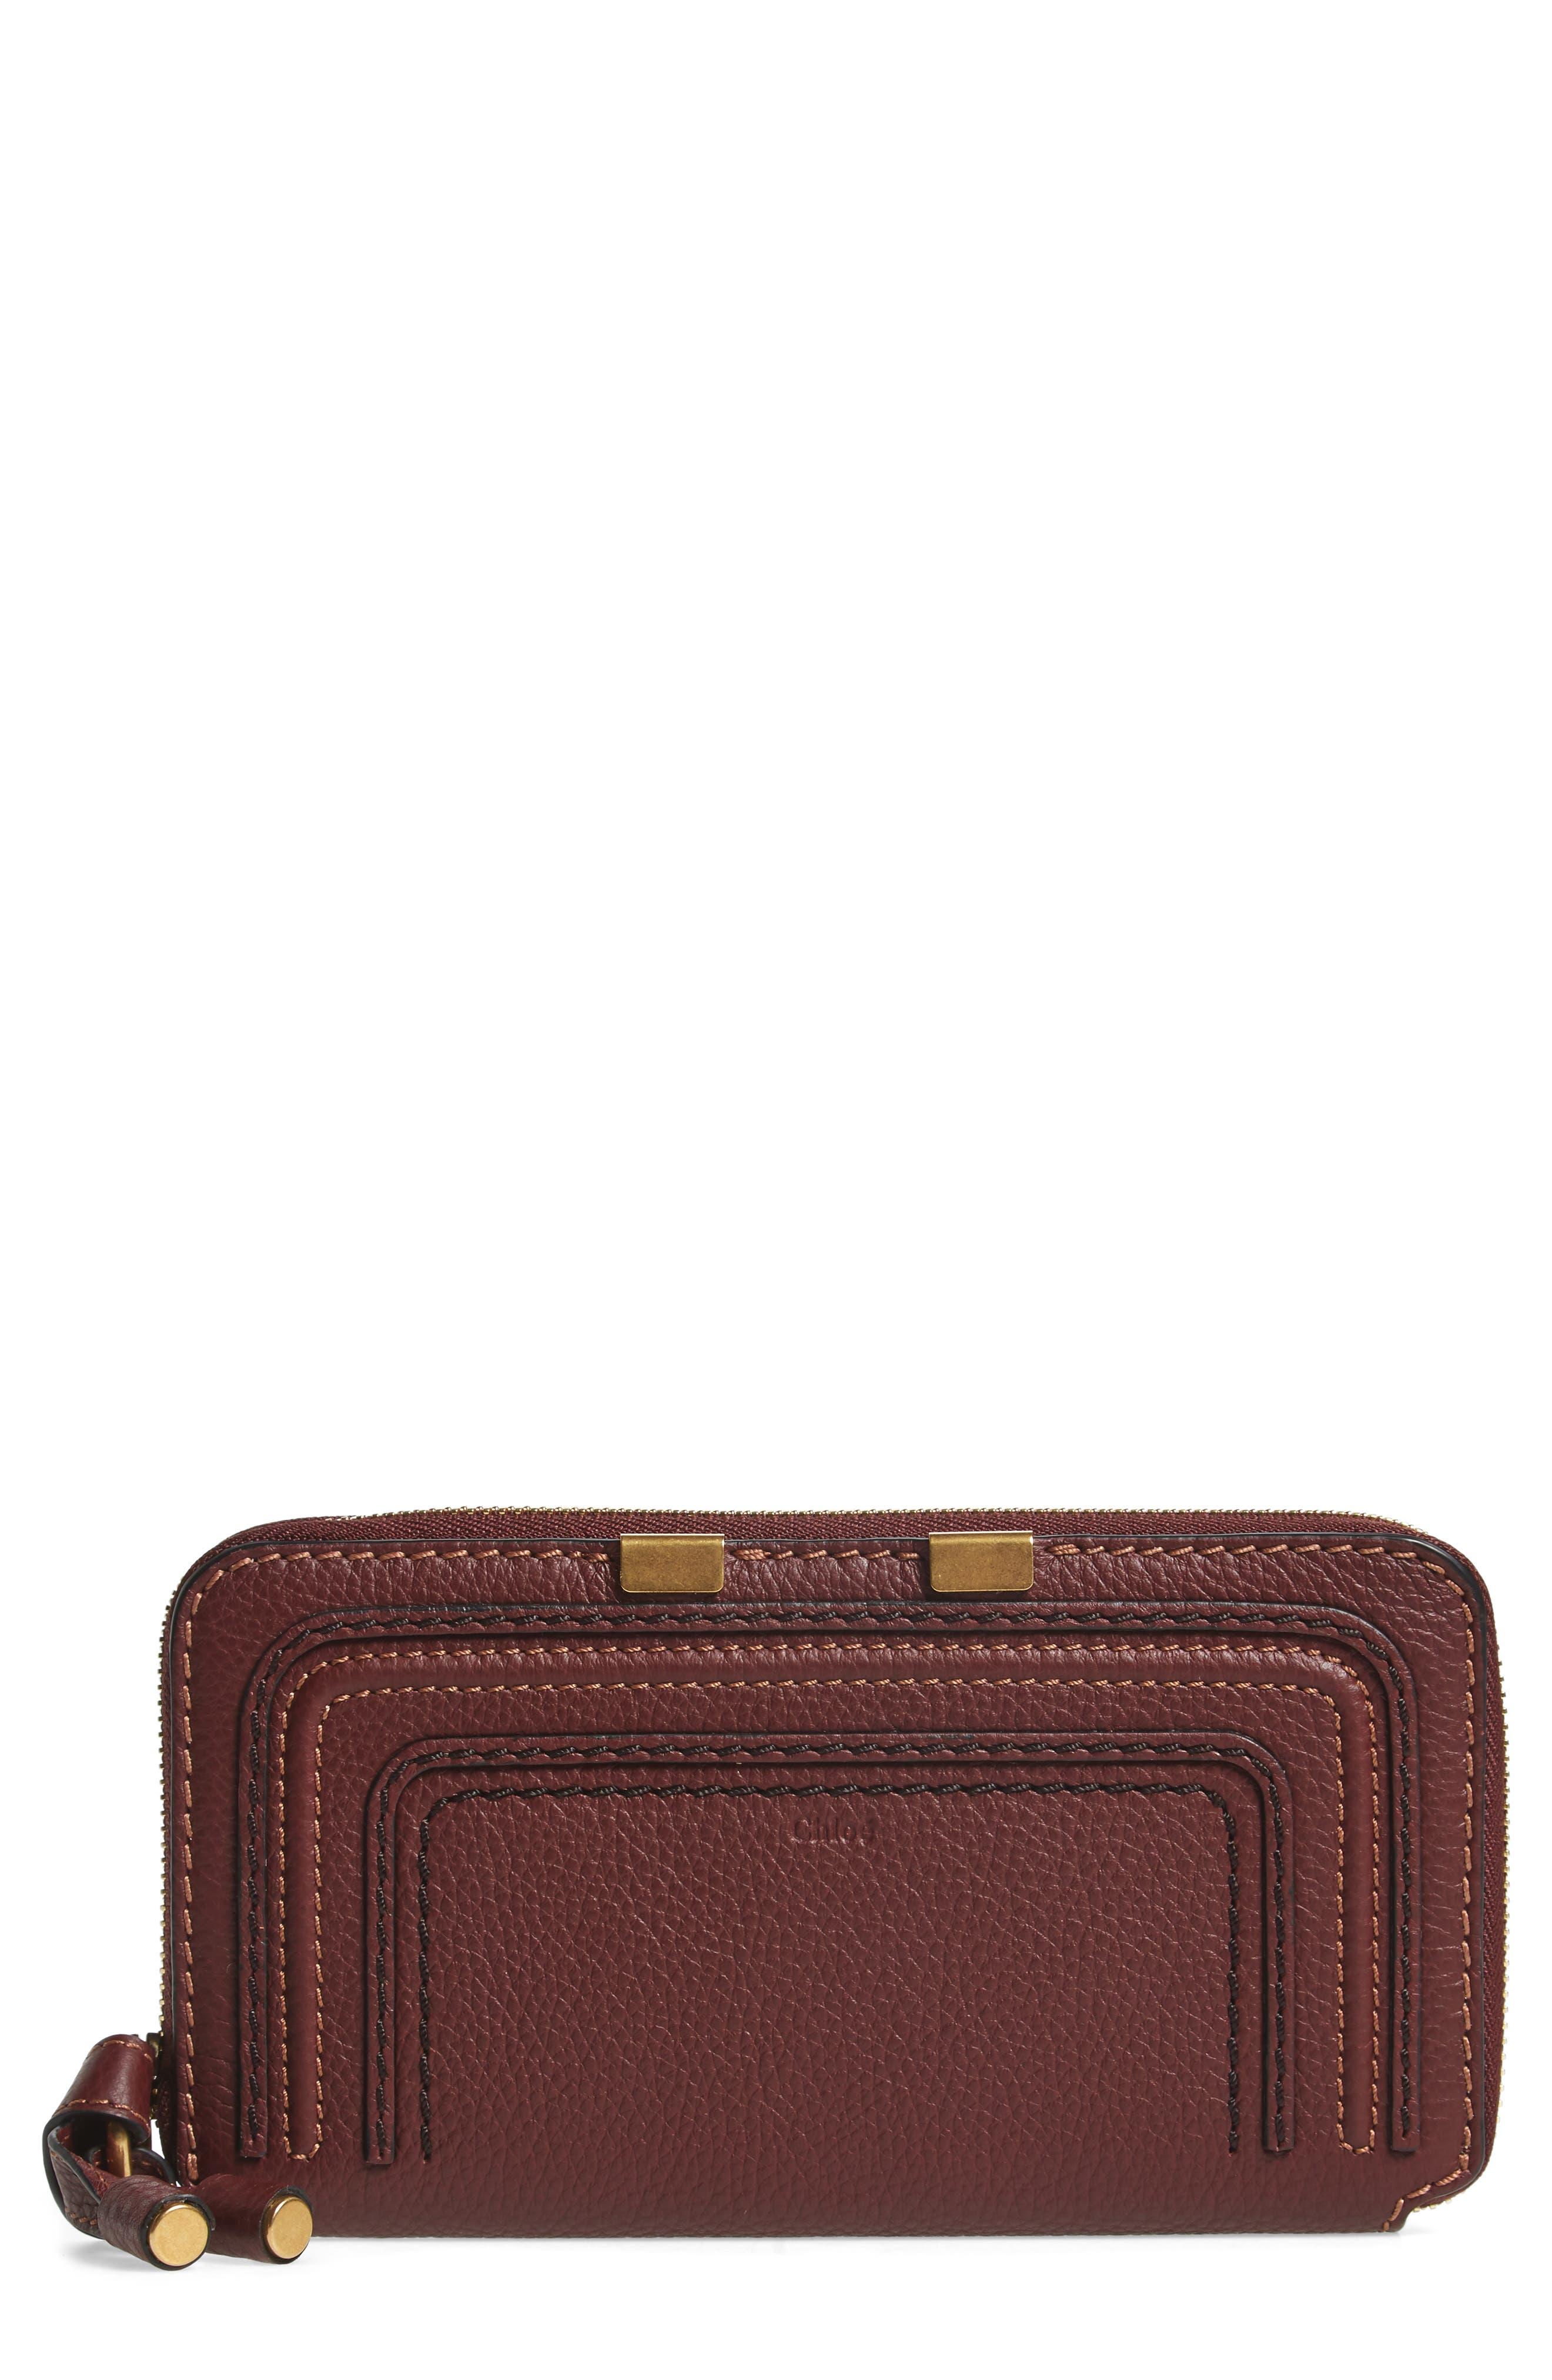 Chloé 'Marcie - Long' Zip Around Wallet